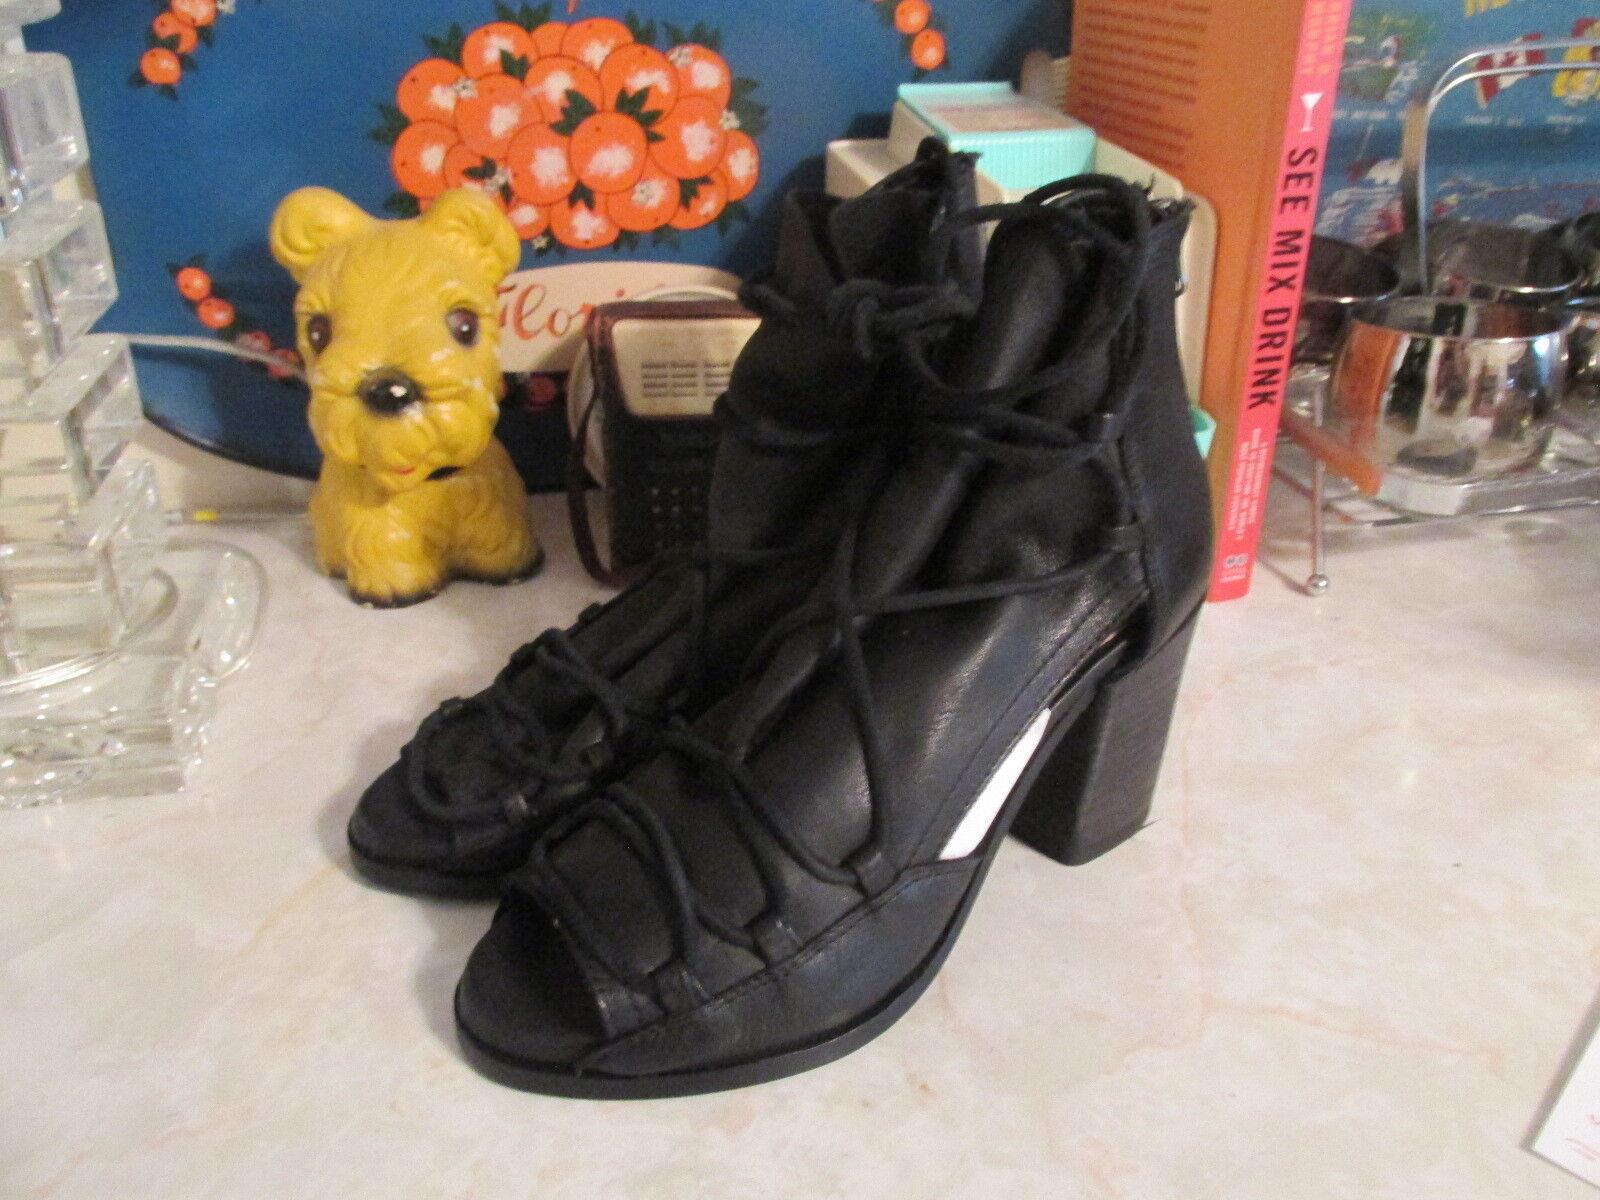 Baske Ariel Leather Lace Up Block Heel Sandal, size 7 fits like 8 Black